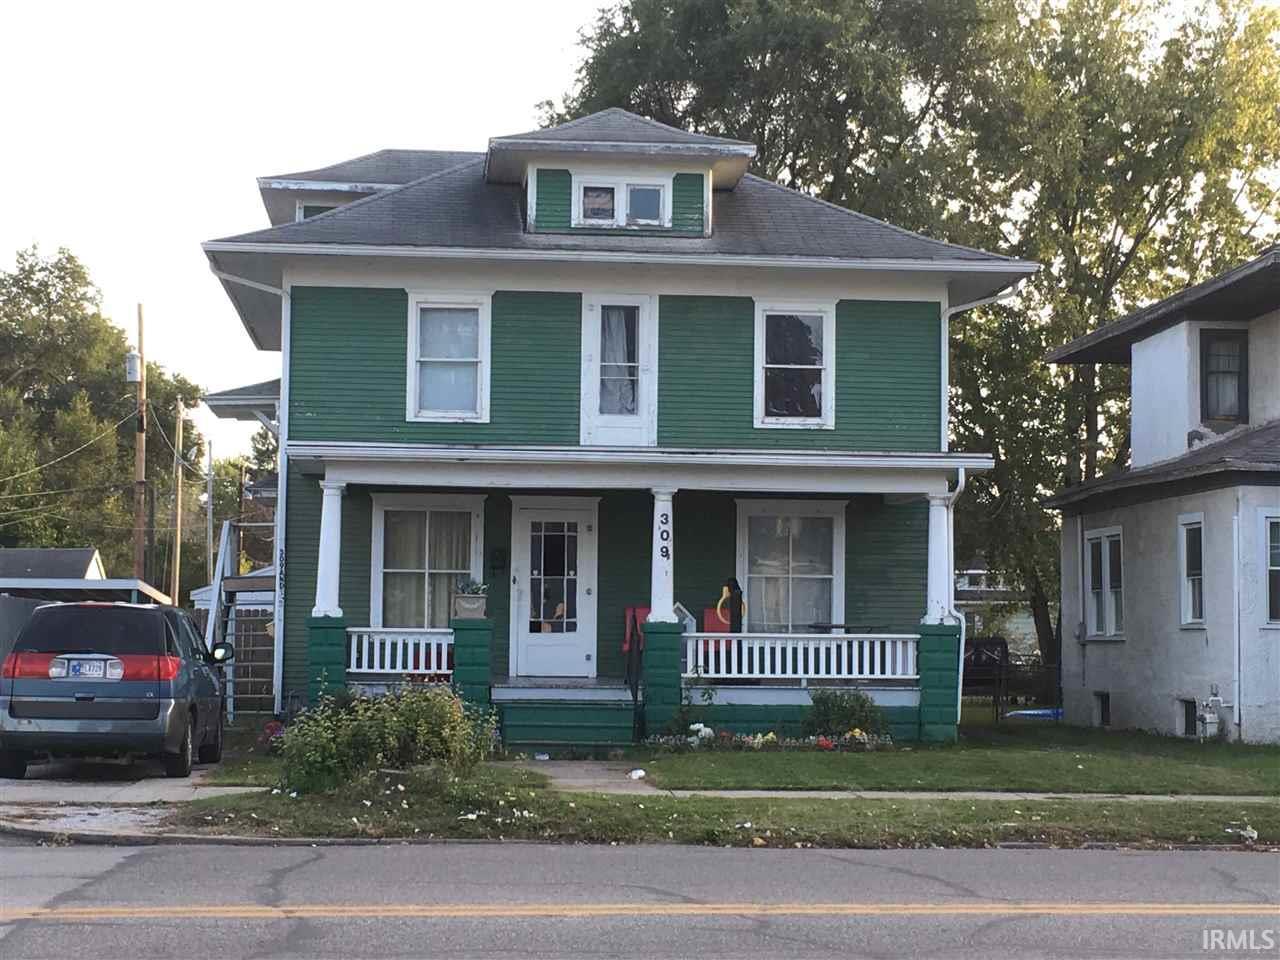 309 E Indiana Elkhart, IN 46516